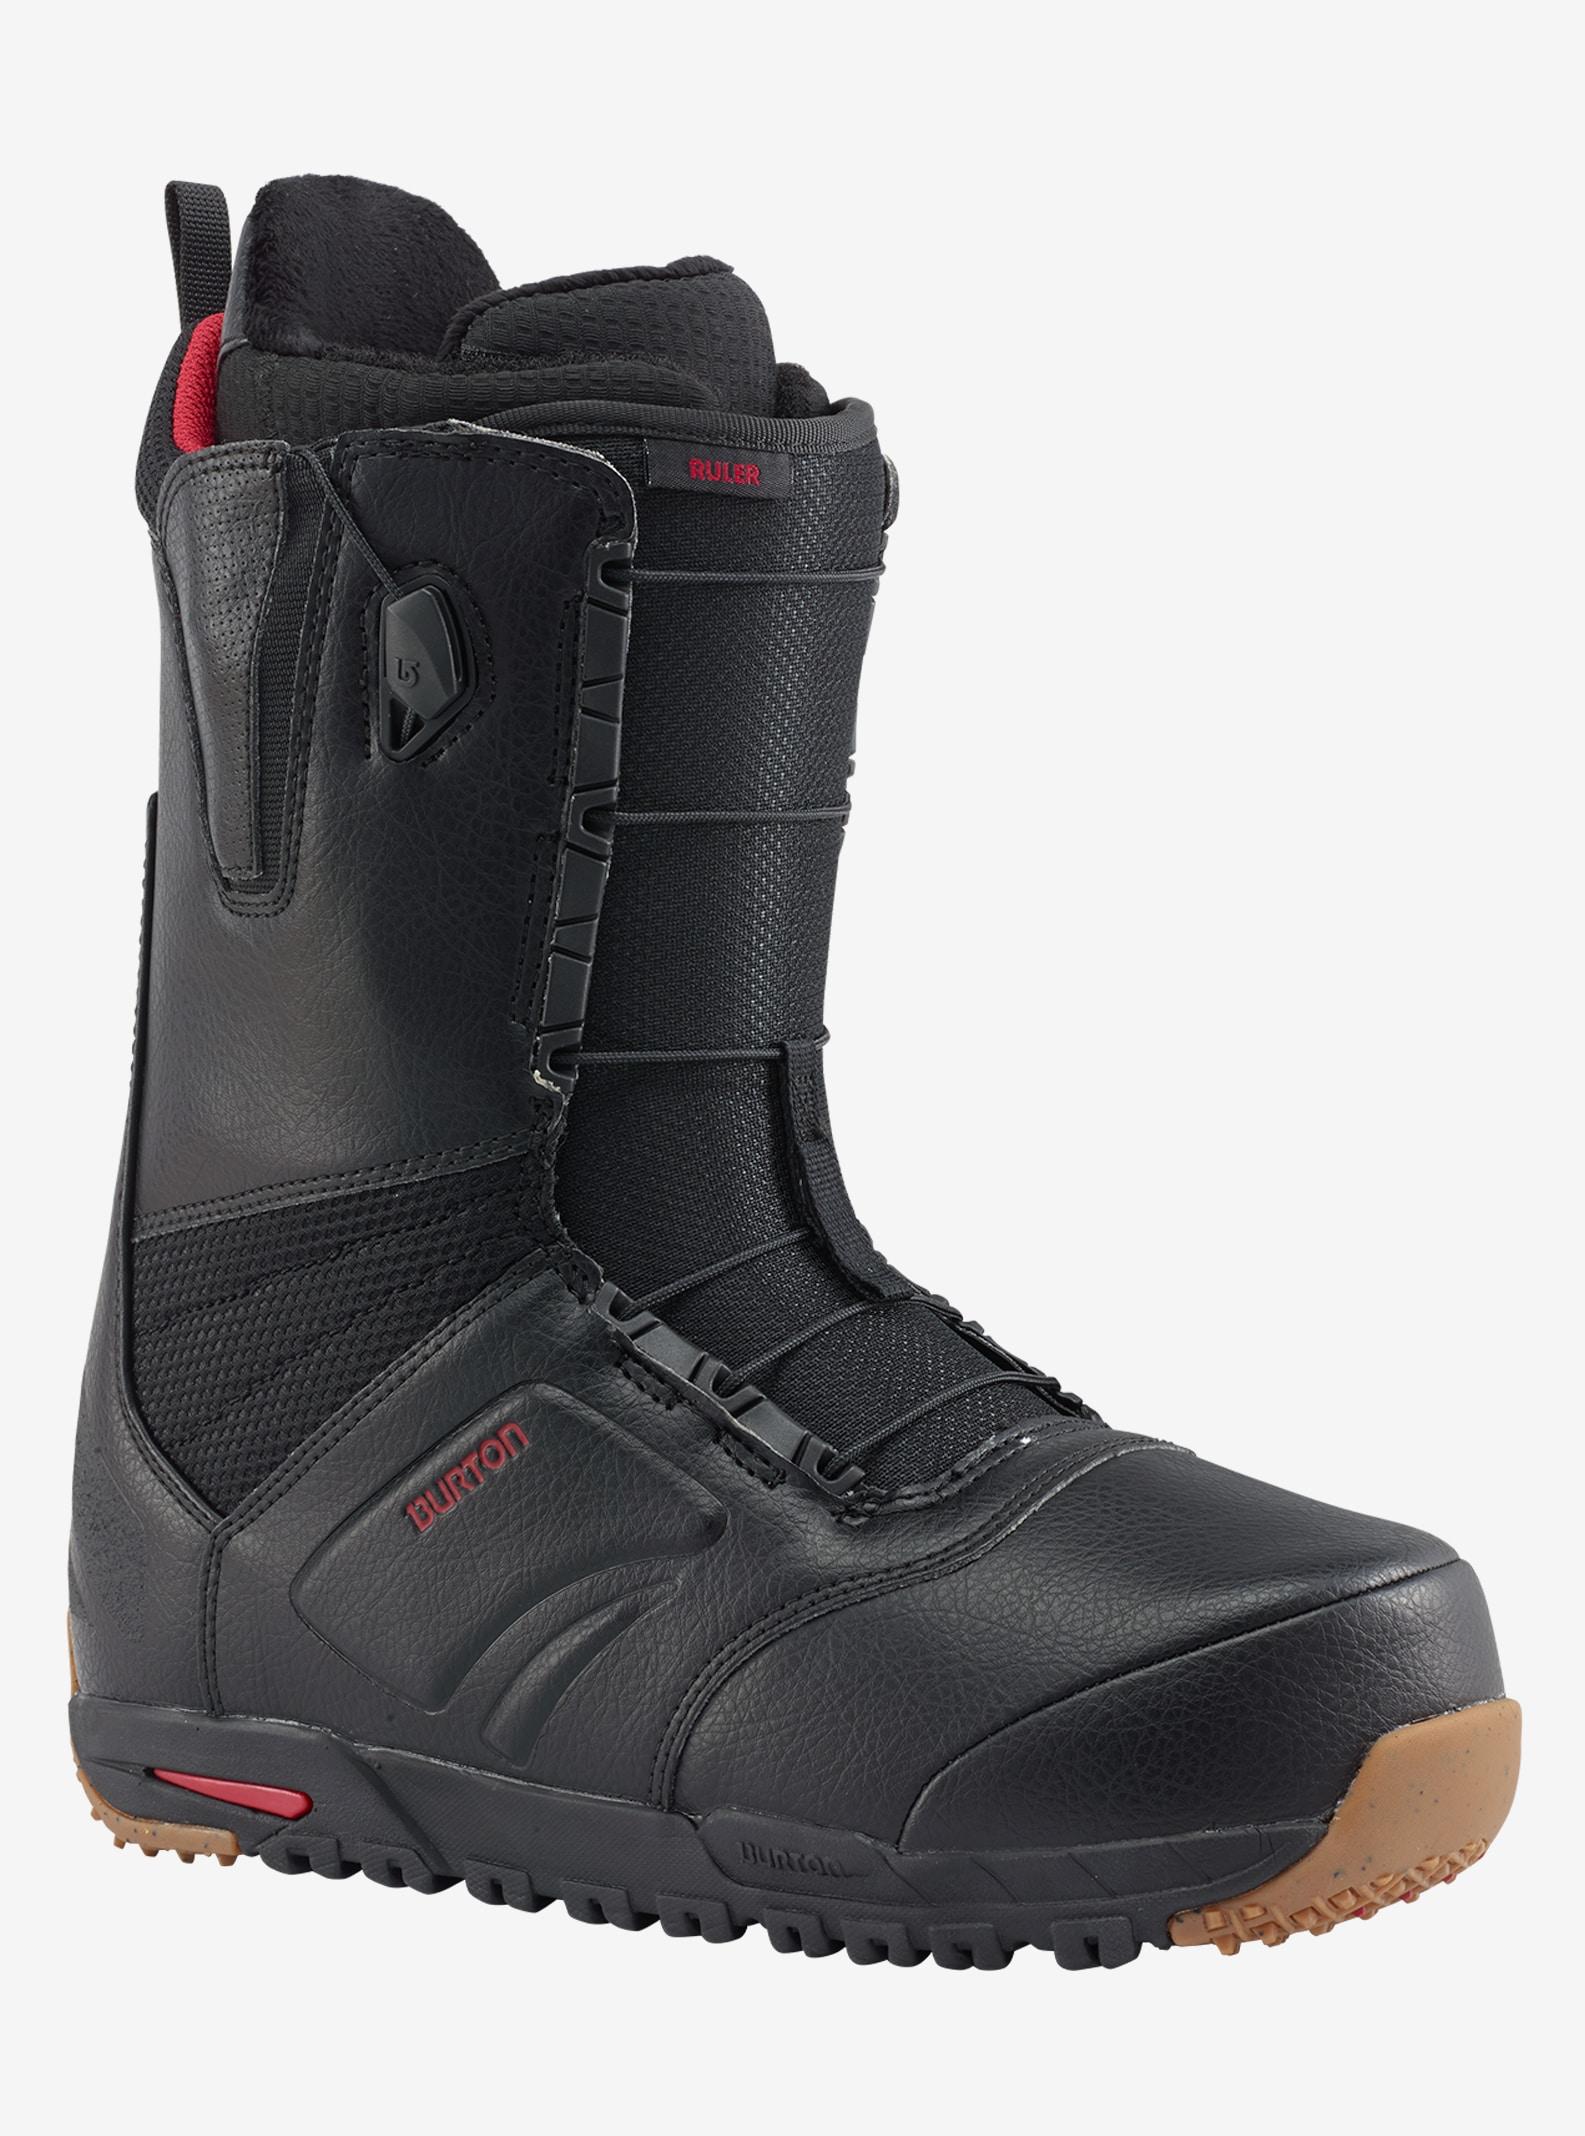 Men's Burton Ruler Wide Snowboard Boot shown in Black